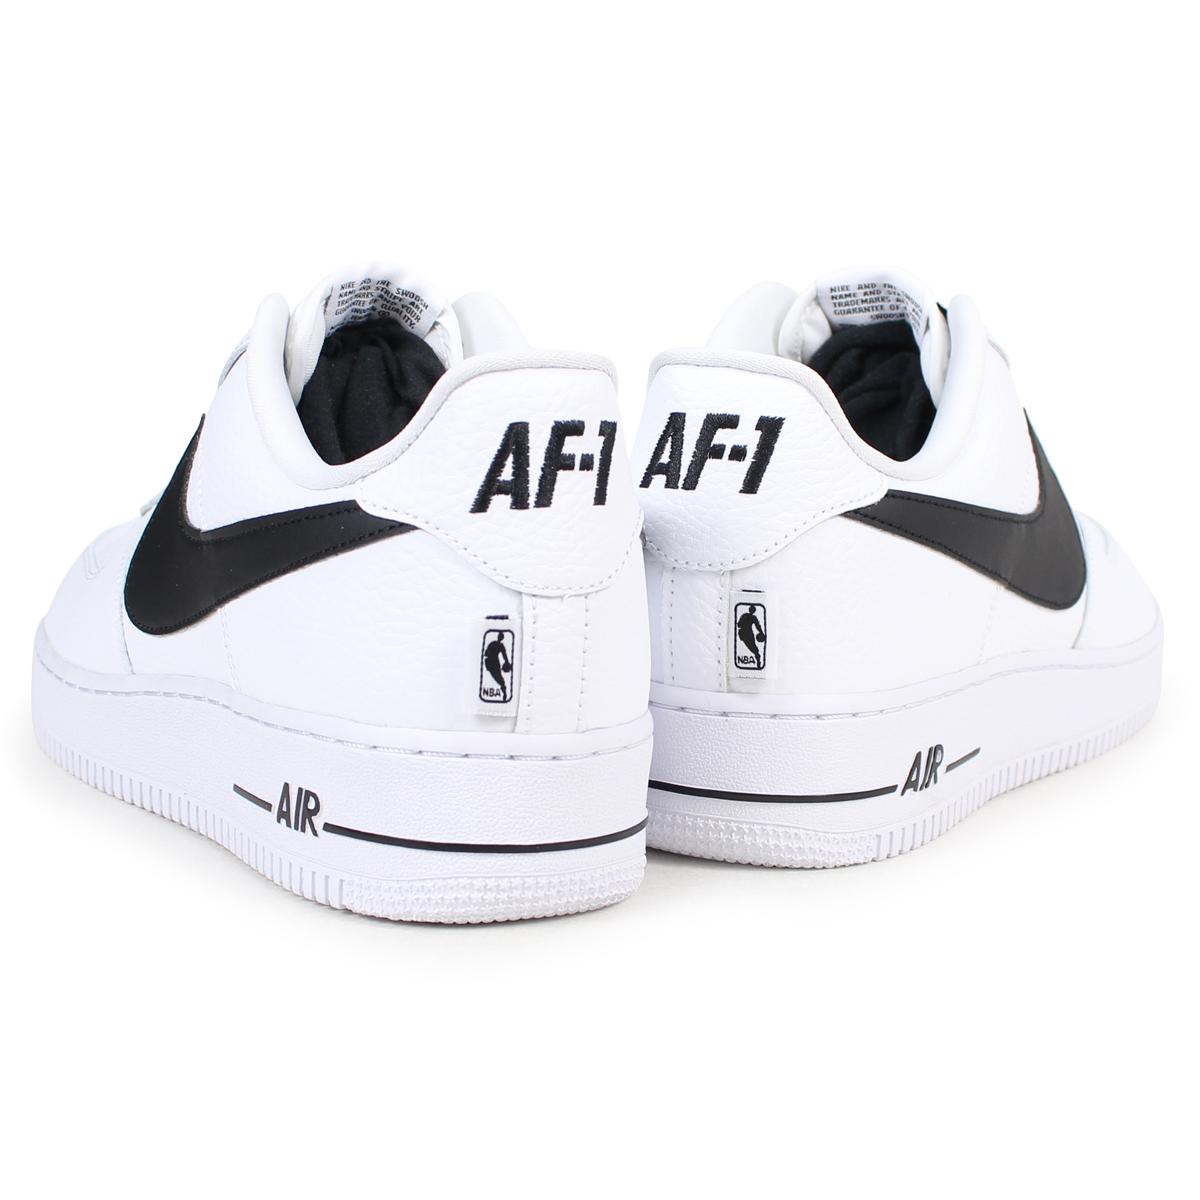 popularne sklepy autentyczny odebrać NIKE AIR FORCE 1 07 STATEMENT GAME Nike air force 1 07 LV8 sneakers men  white 823,511-103 [183]